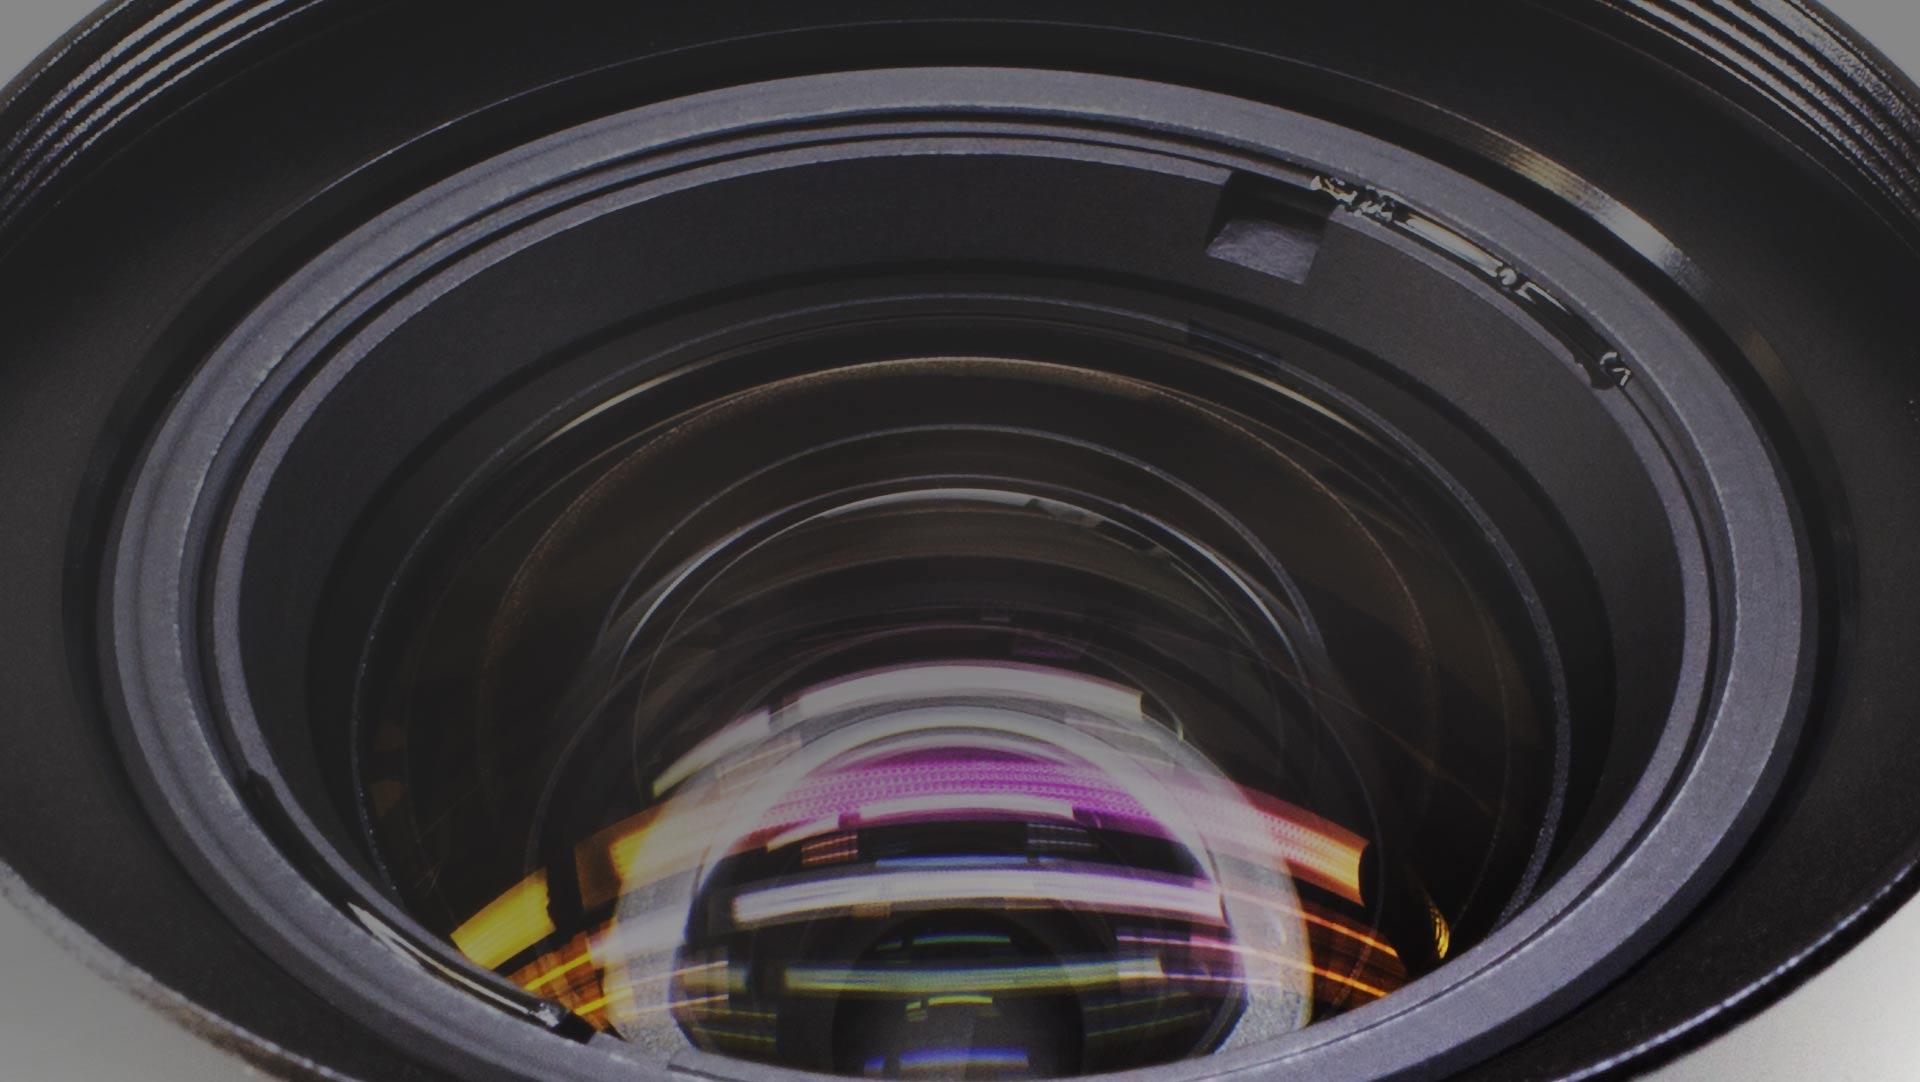 up-close image of machine vision camera lens